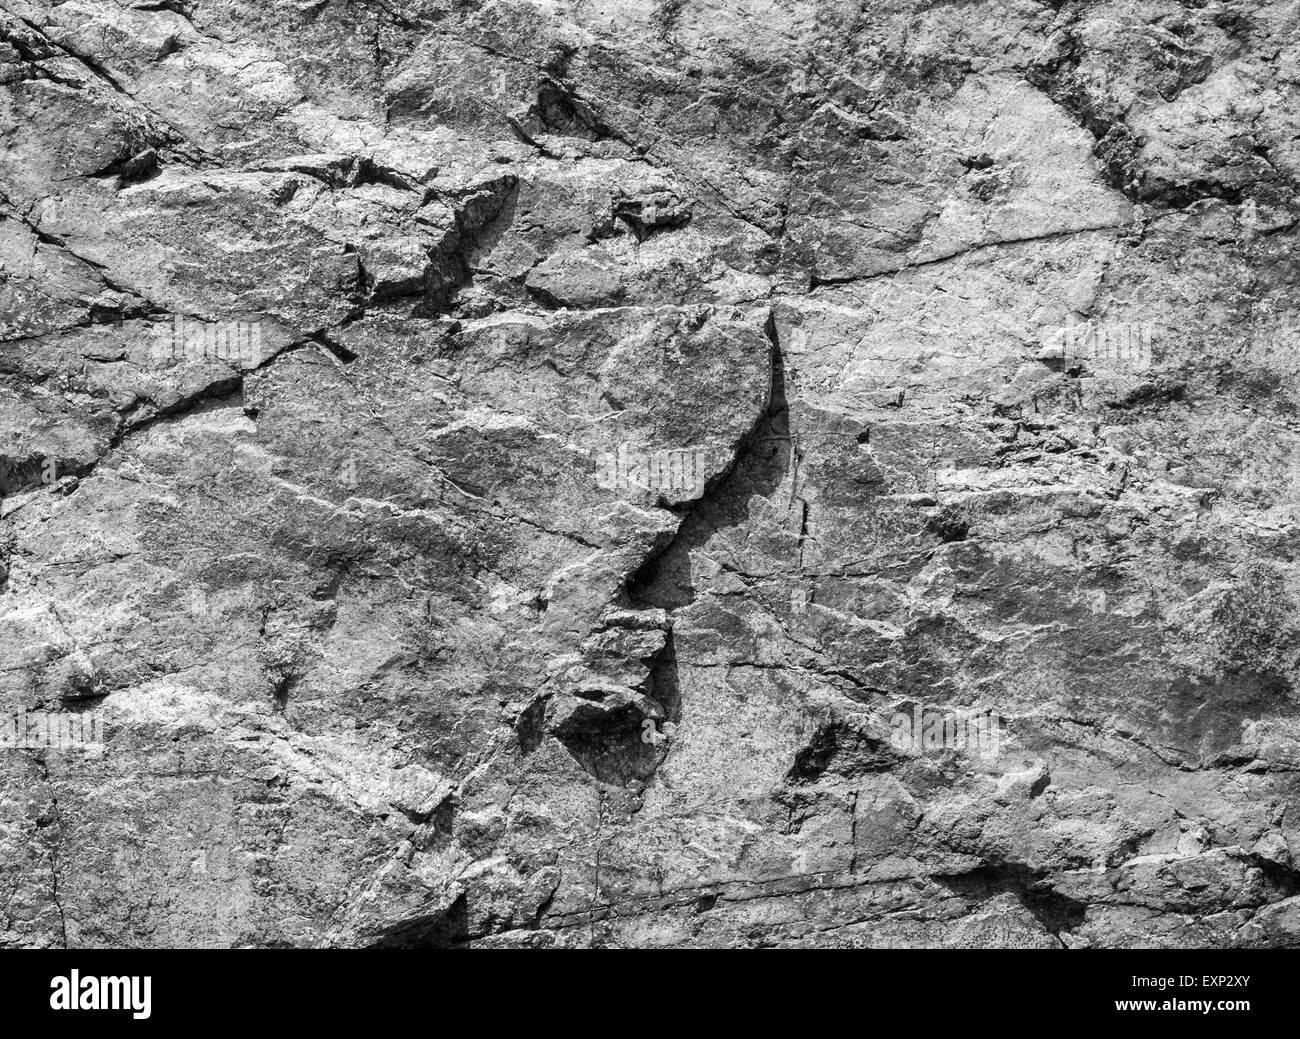 Rough Granite Stone : Rough dark gray rock wall natural stone surface